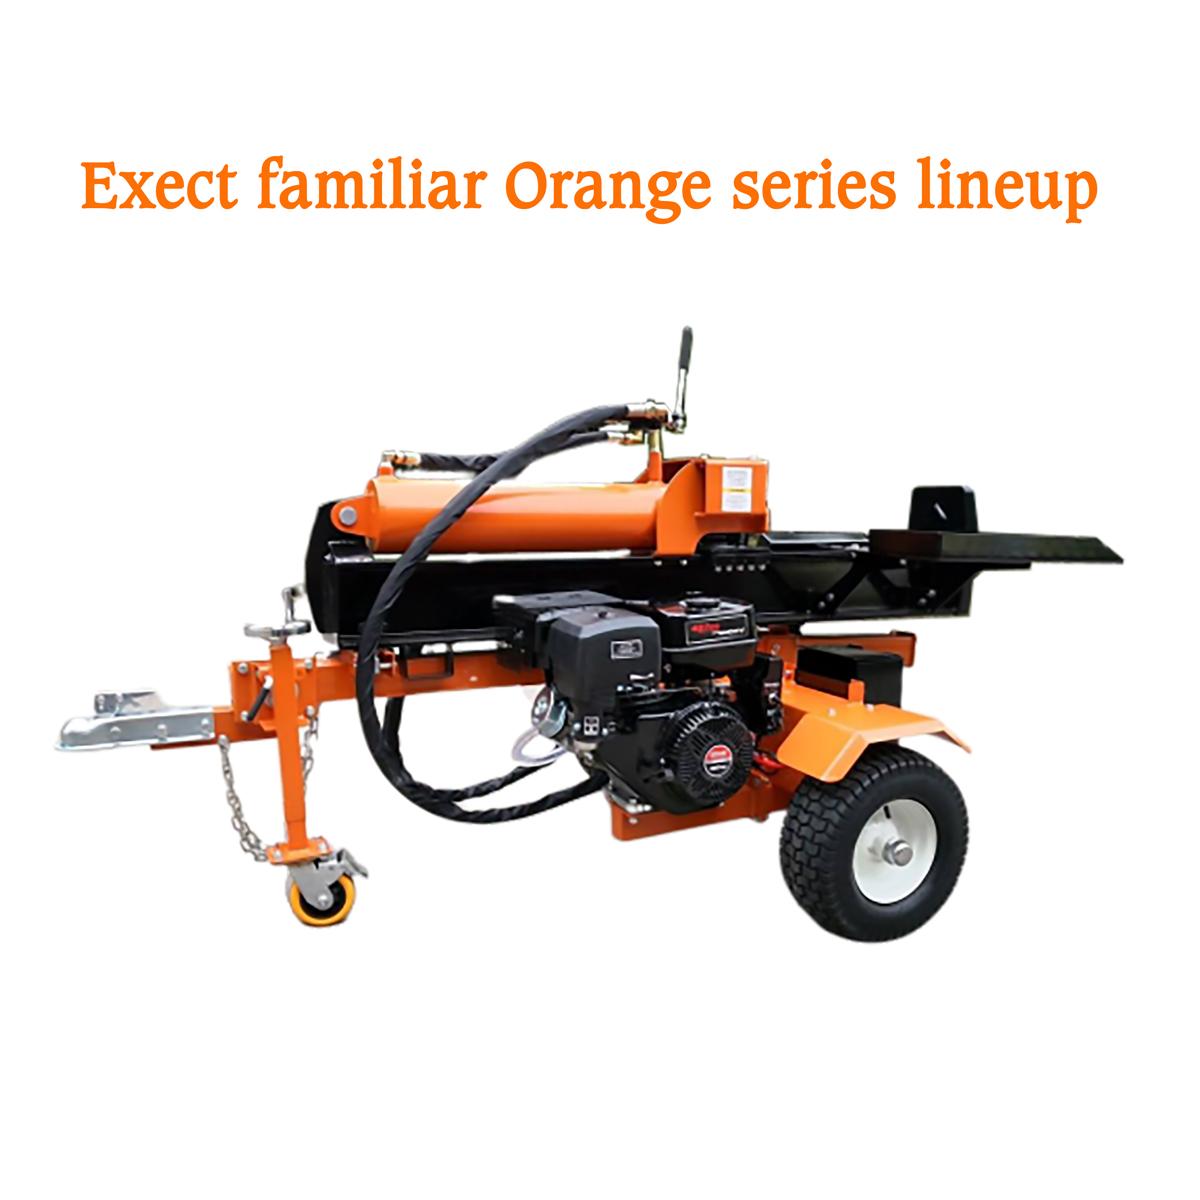 Exectfamiliar Orangeseries 2年間保証 エンジン薪割り機 50t 重量410kg OHV15馬力 最大油圧シリンダー